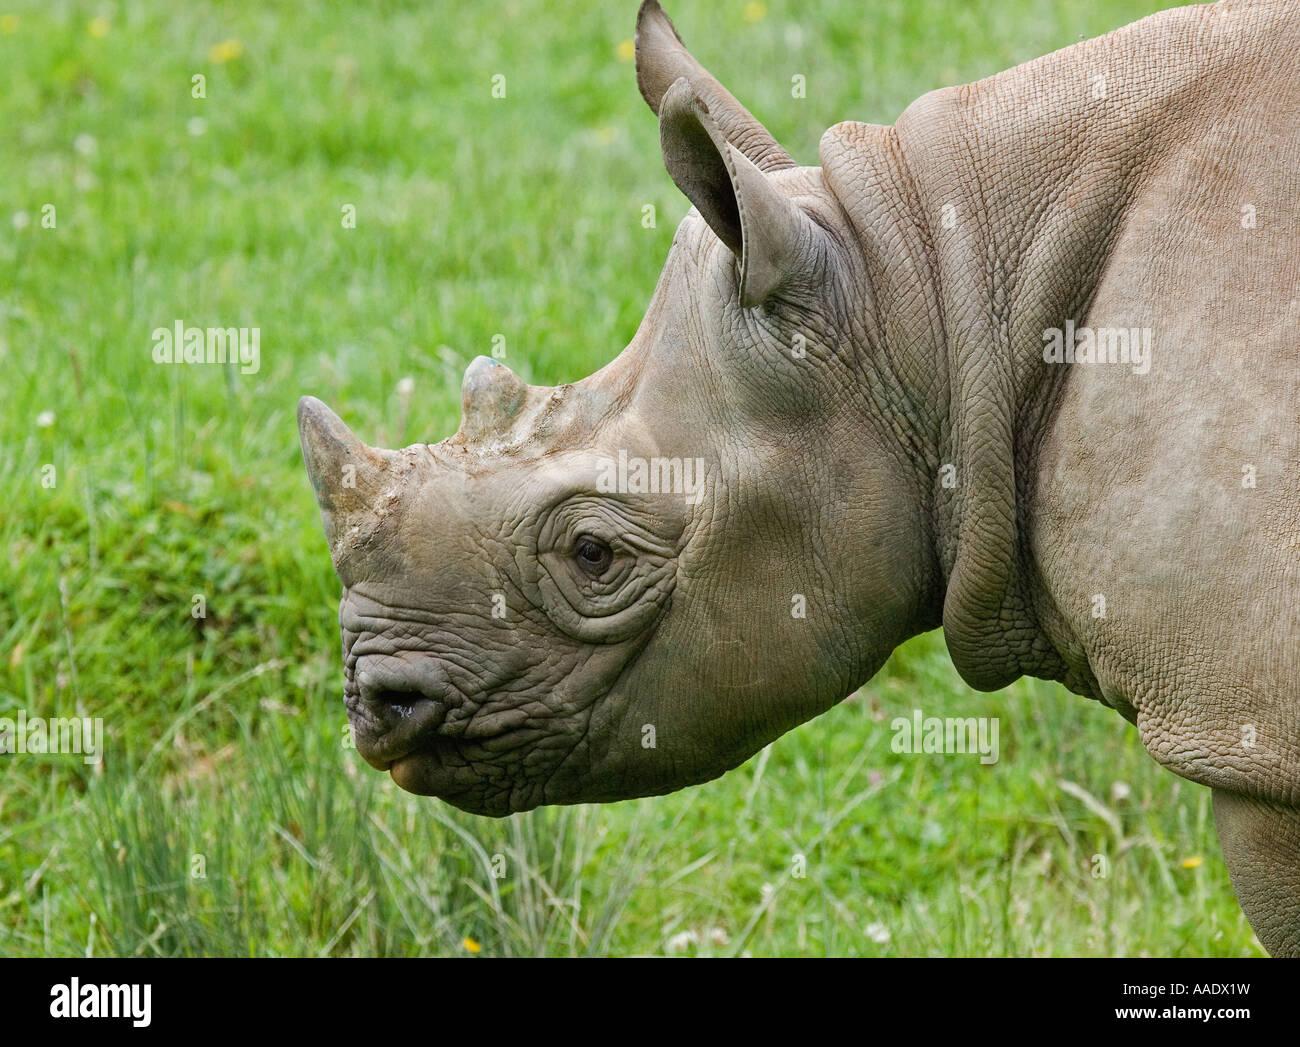 Black Rhinoceros (cap) - Stock Image